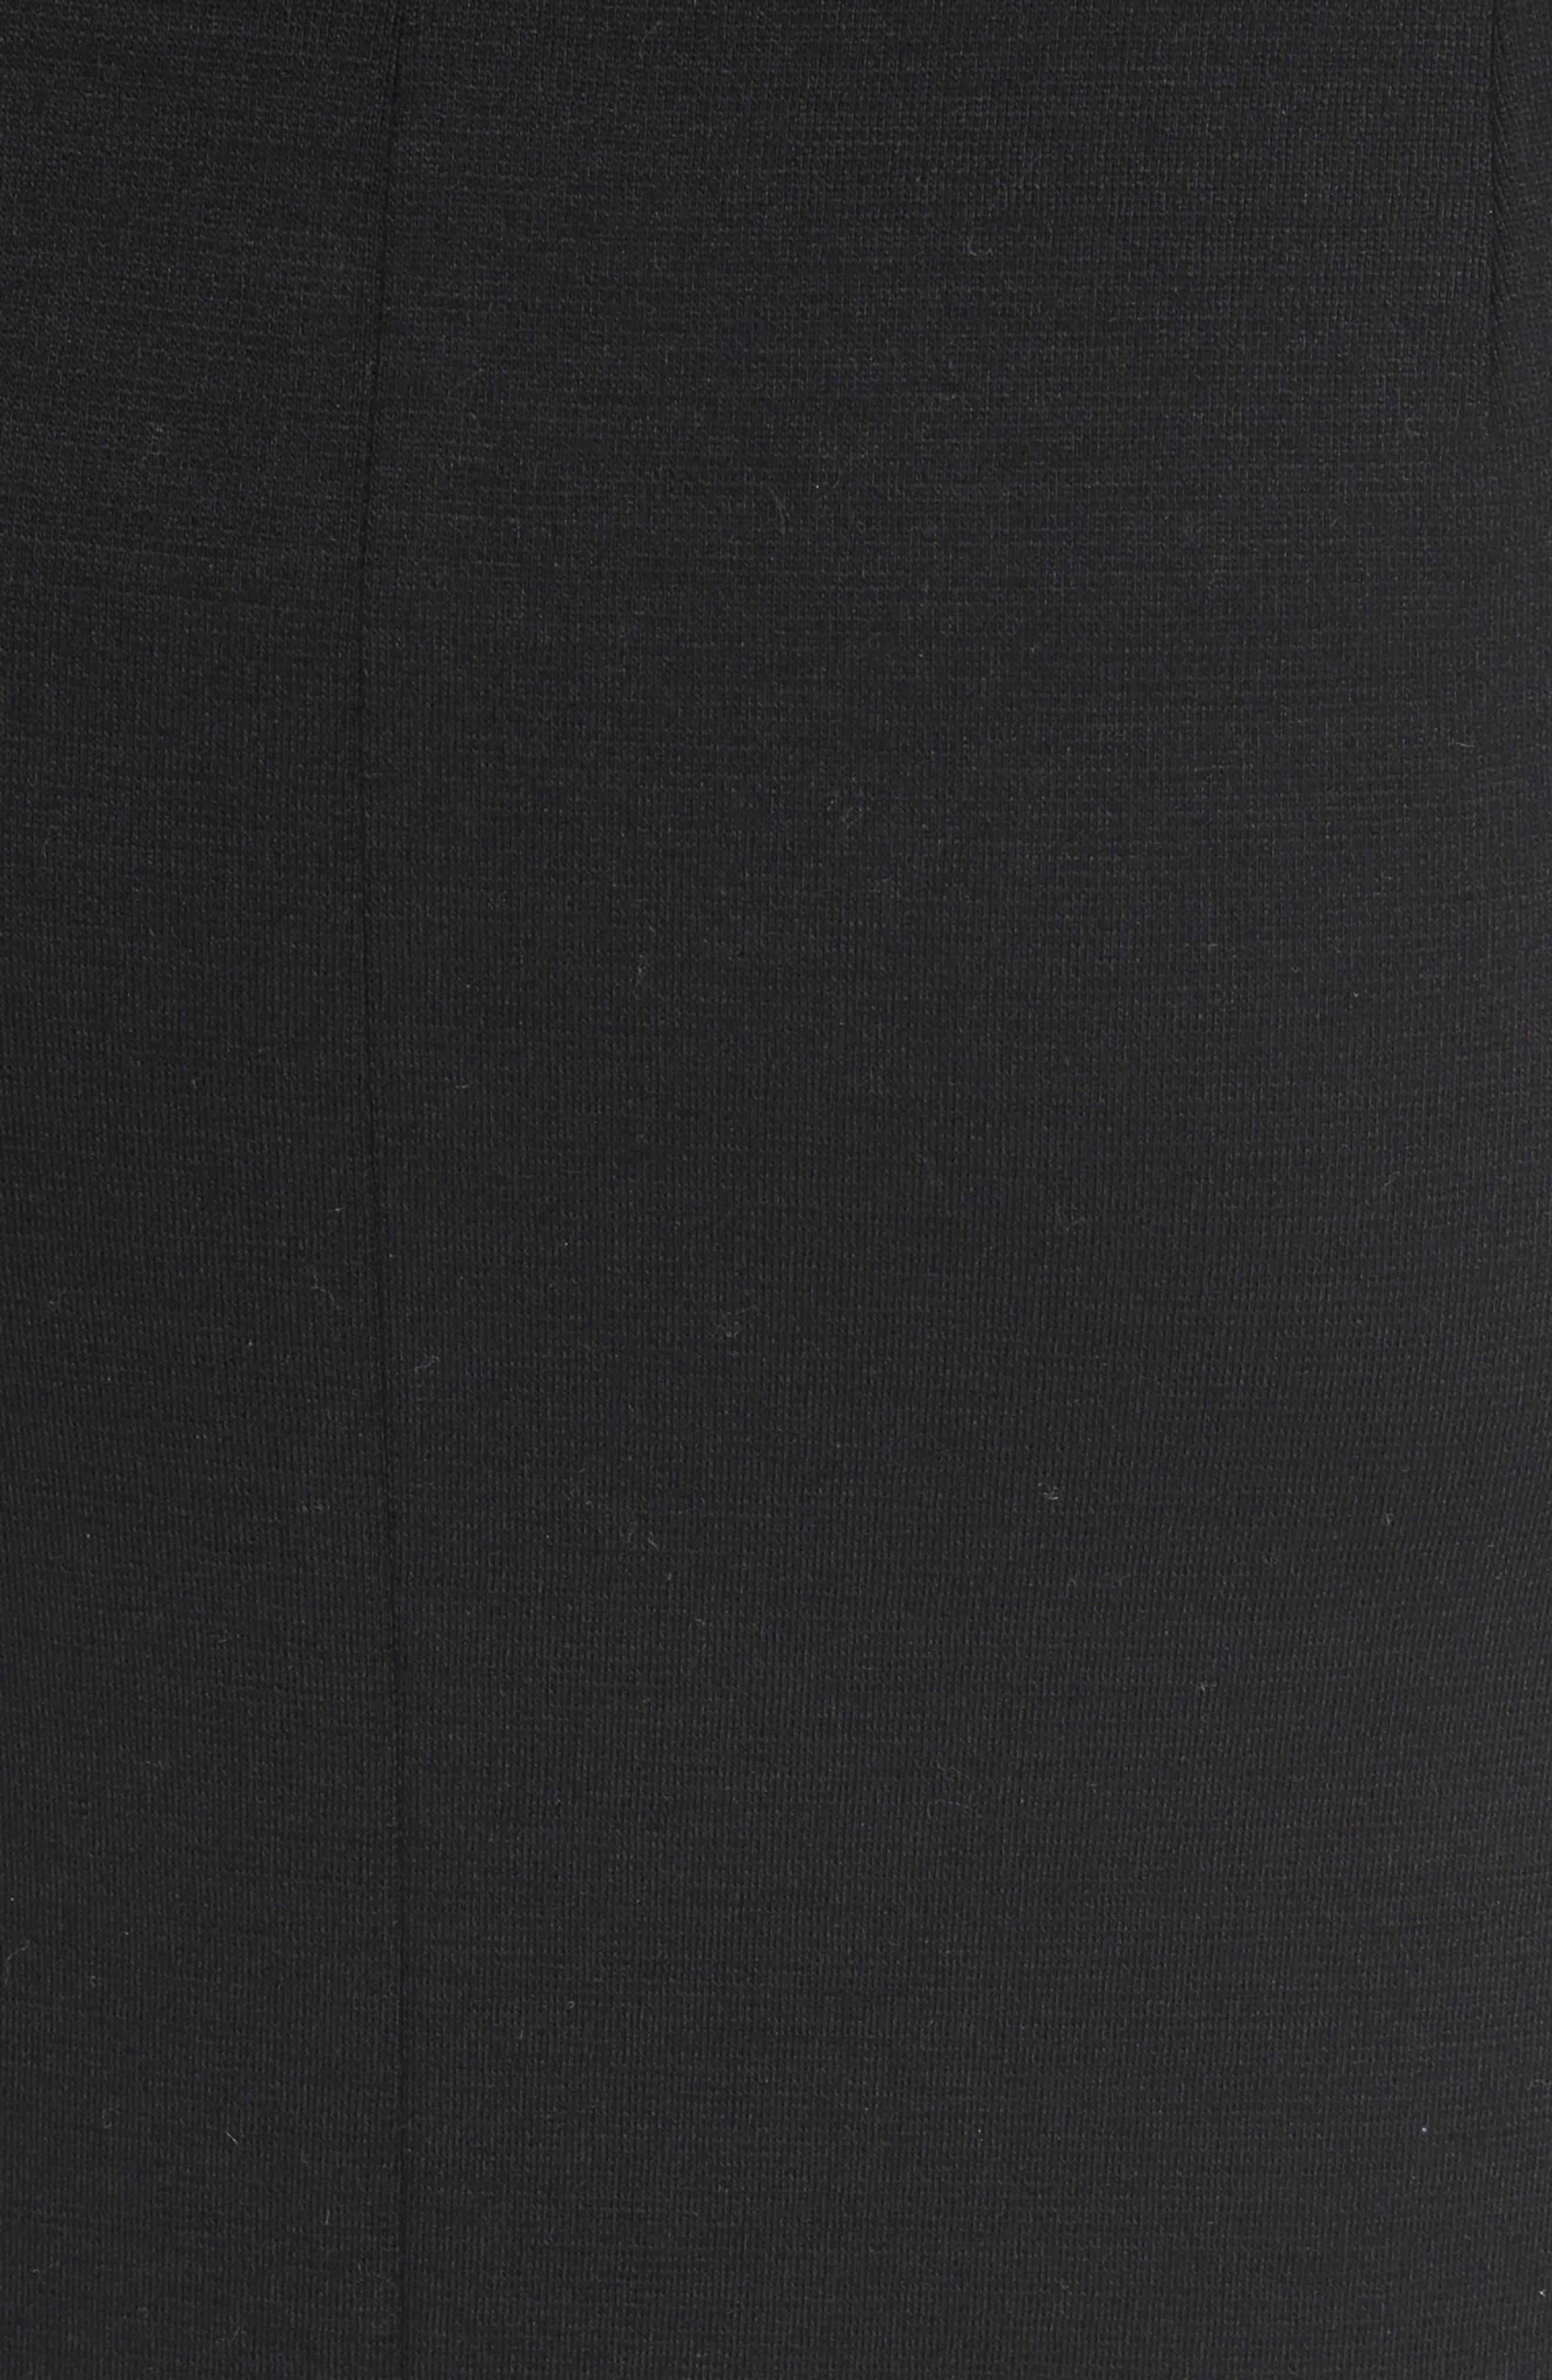 Button Detail Wool Knit Skirt,                             Alternate thumbnail 6, color,                             Black